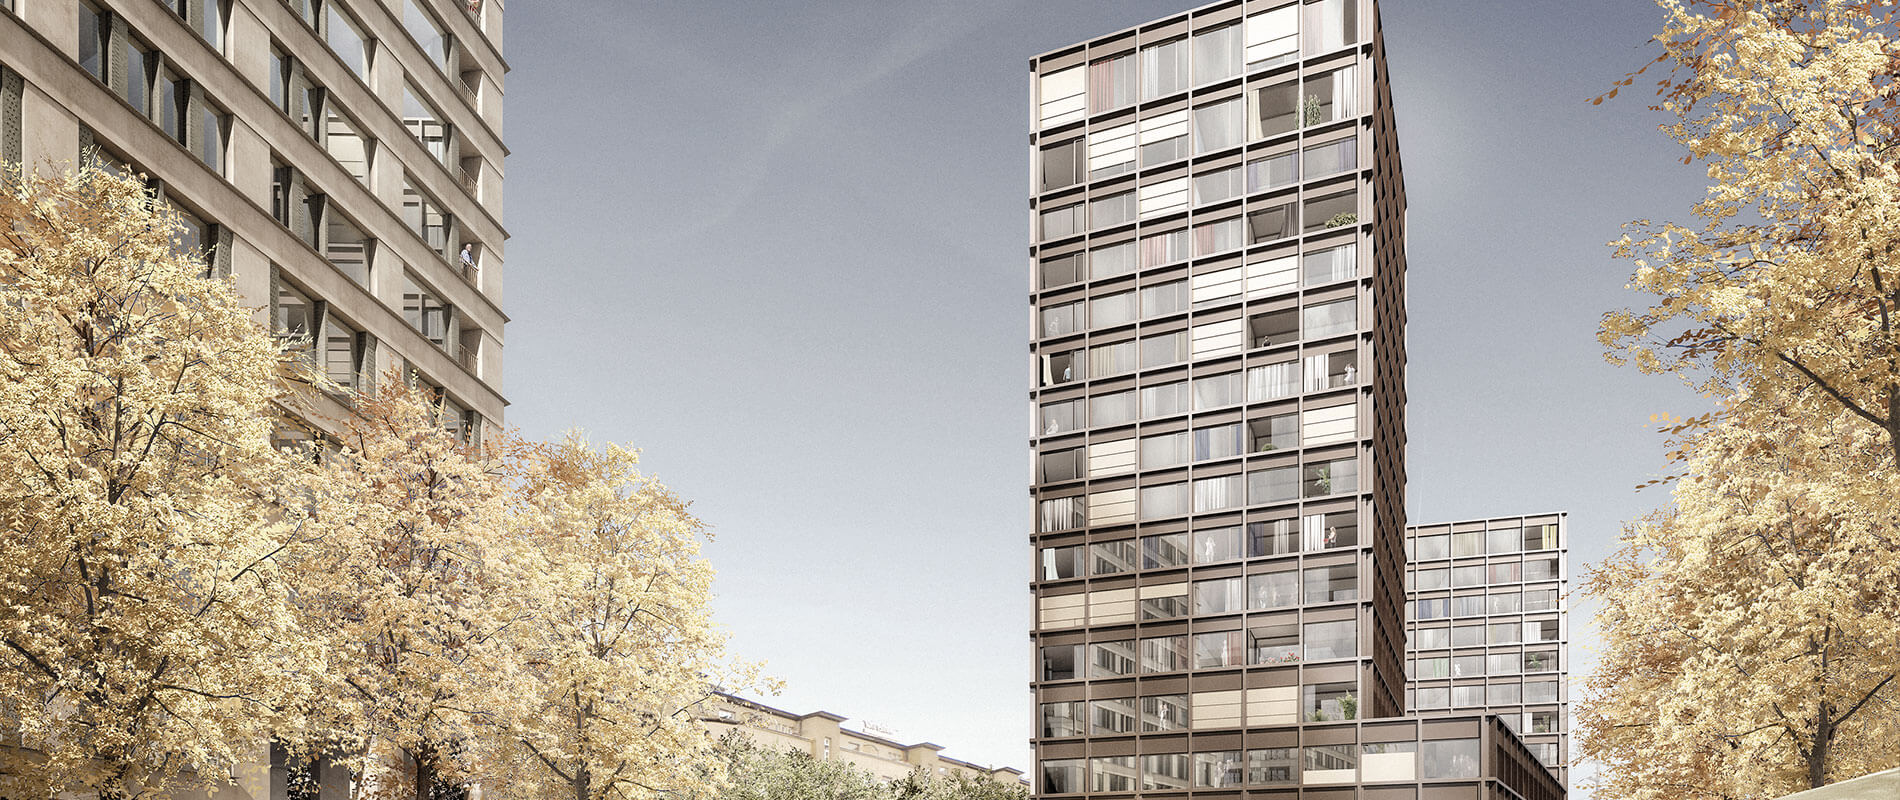 Gebäude Europaallee, Baufeld G |Referenz |Ettinger Partner